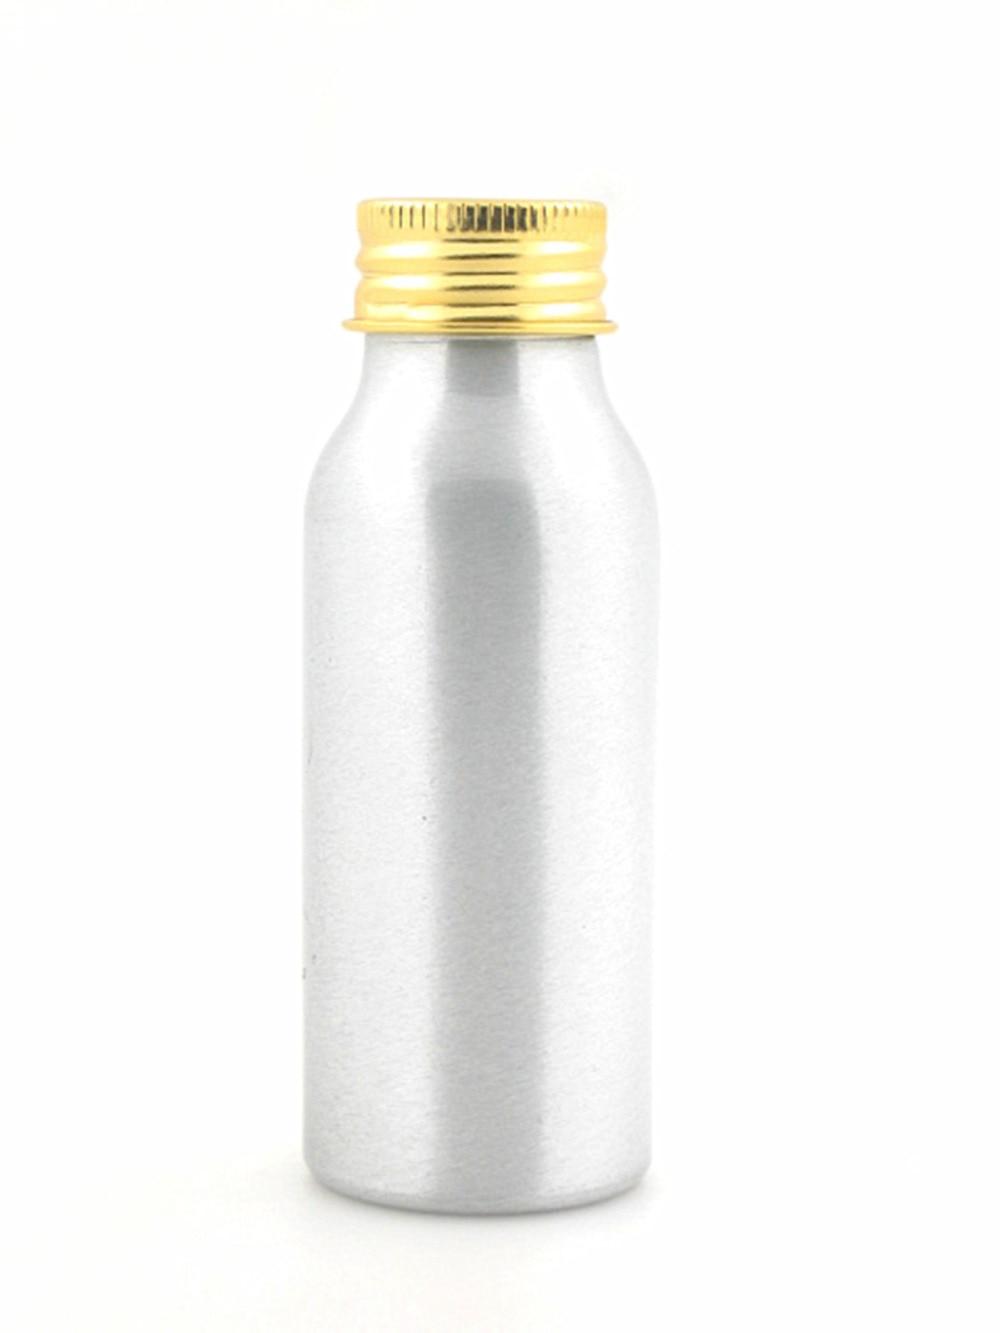 2oz/60ml Empty Aluminum Bottles, Sliver Metal Bottle With Gold/silver Lined Aluminum Lid